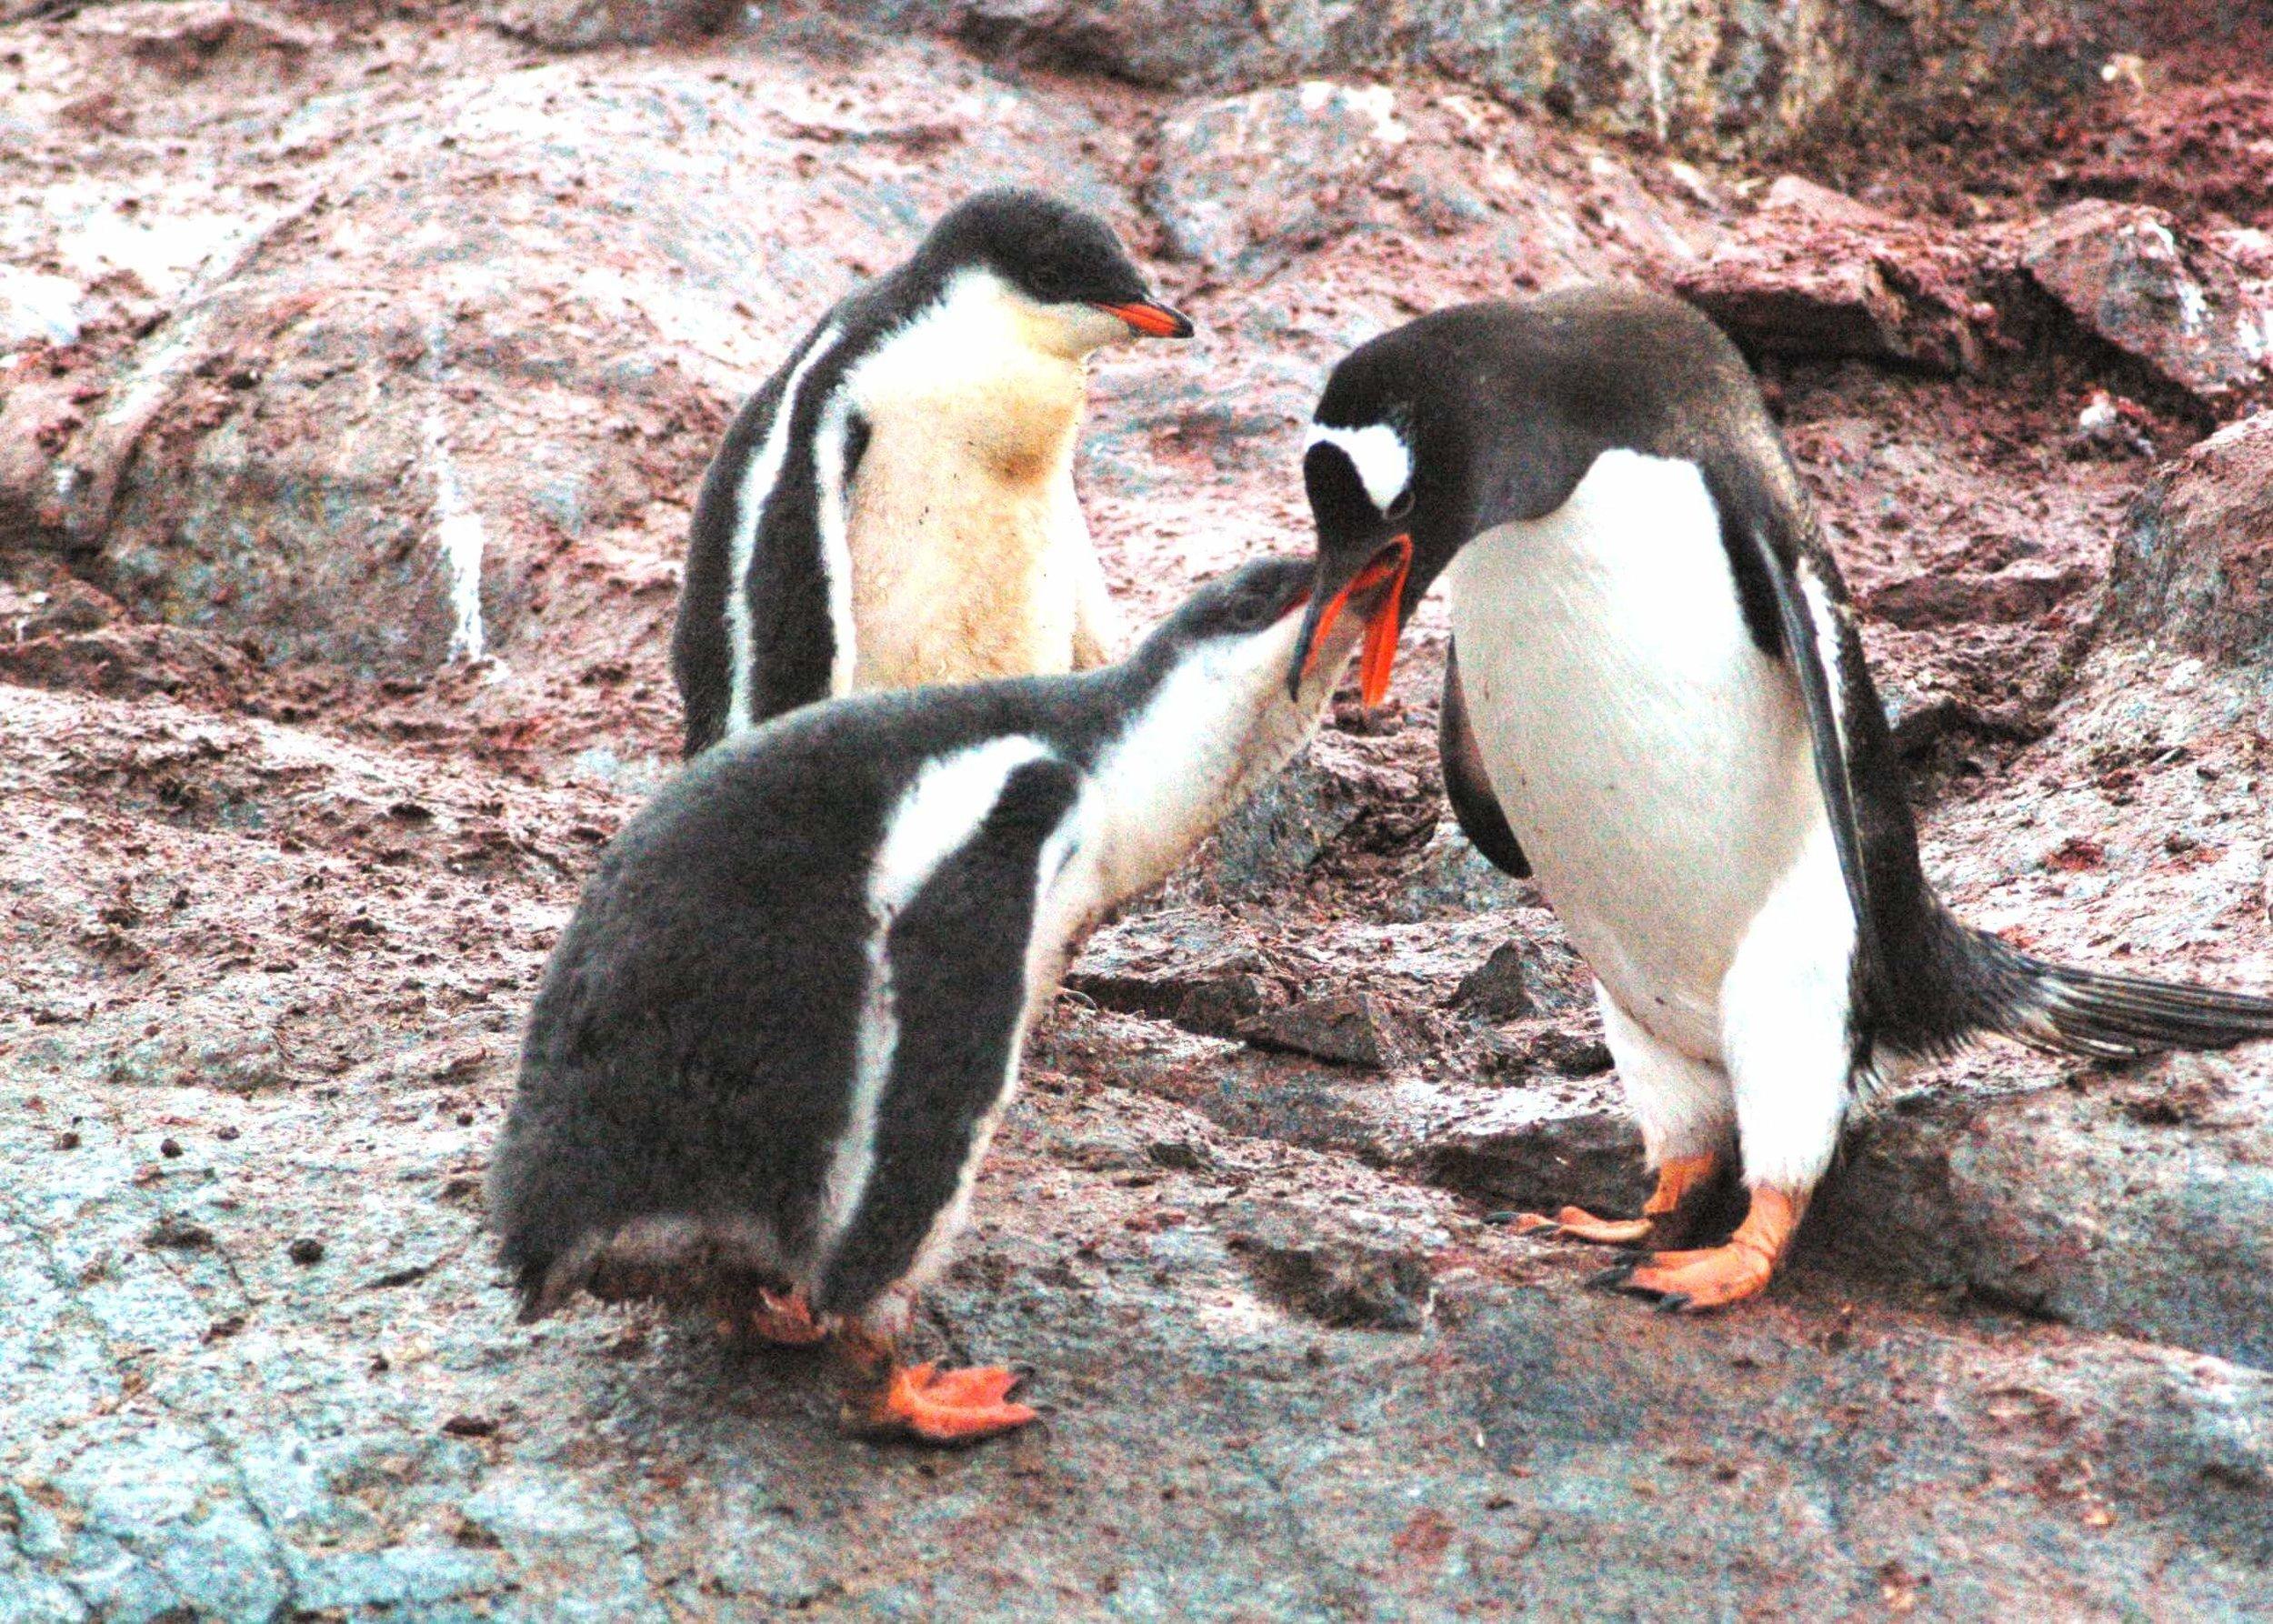 Antarctica_Nikon_20130203_070625_368.JPG